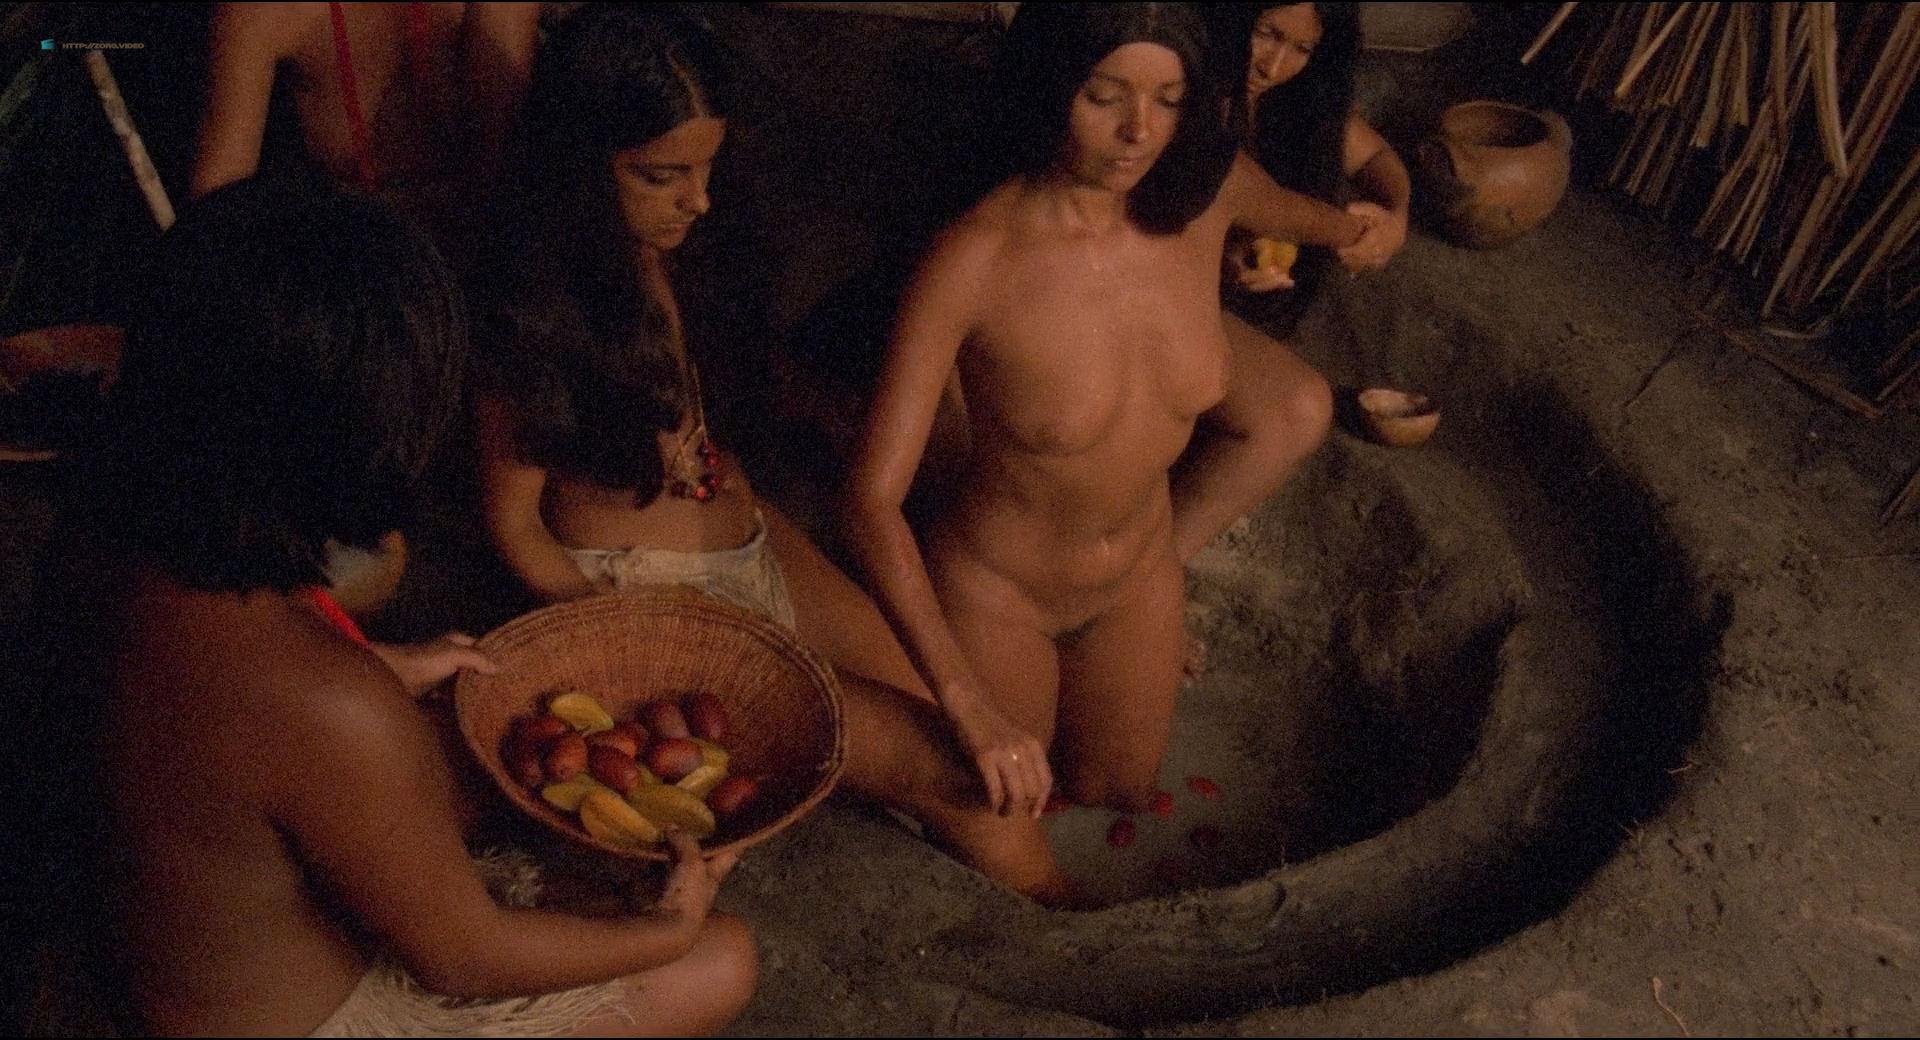 Elvire Audray nude Sara Fleszer, Jessica Bridges all nude full frontal - White Slave (IT-1985) HD 1080p BluRay (6)